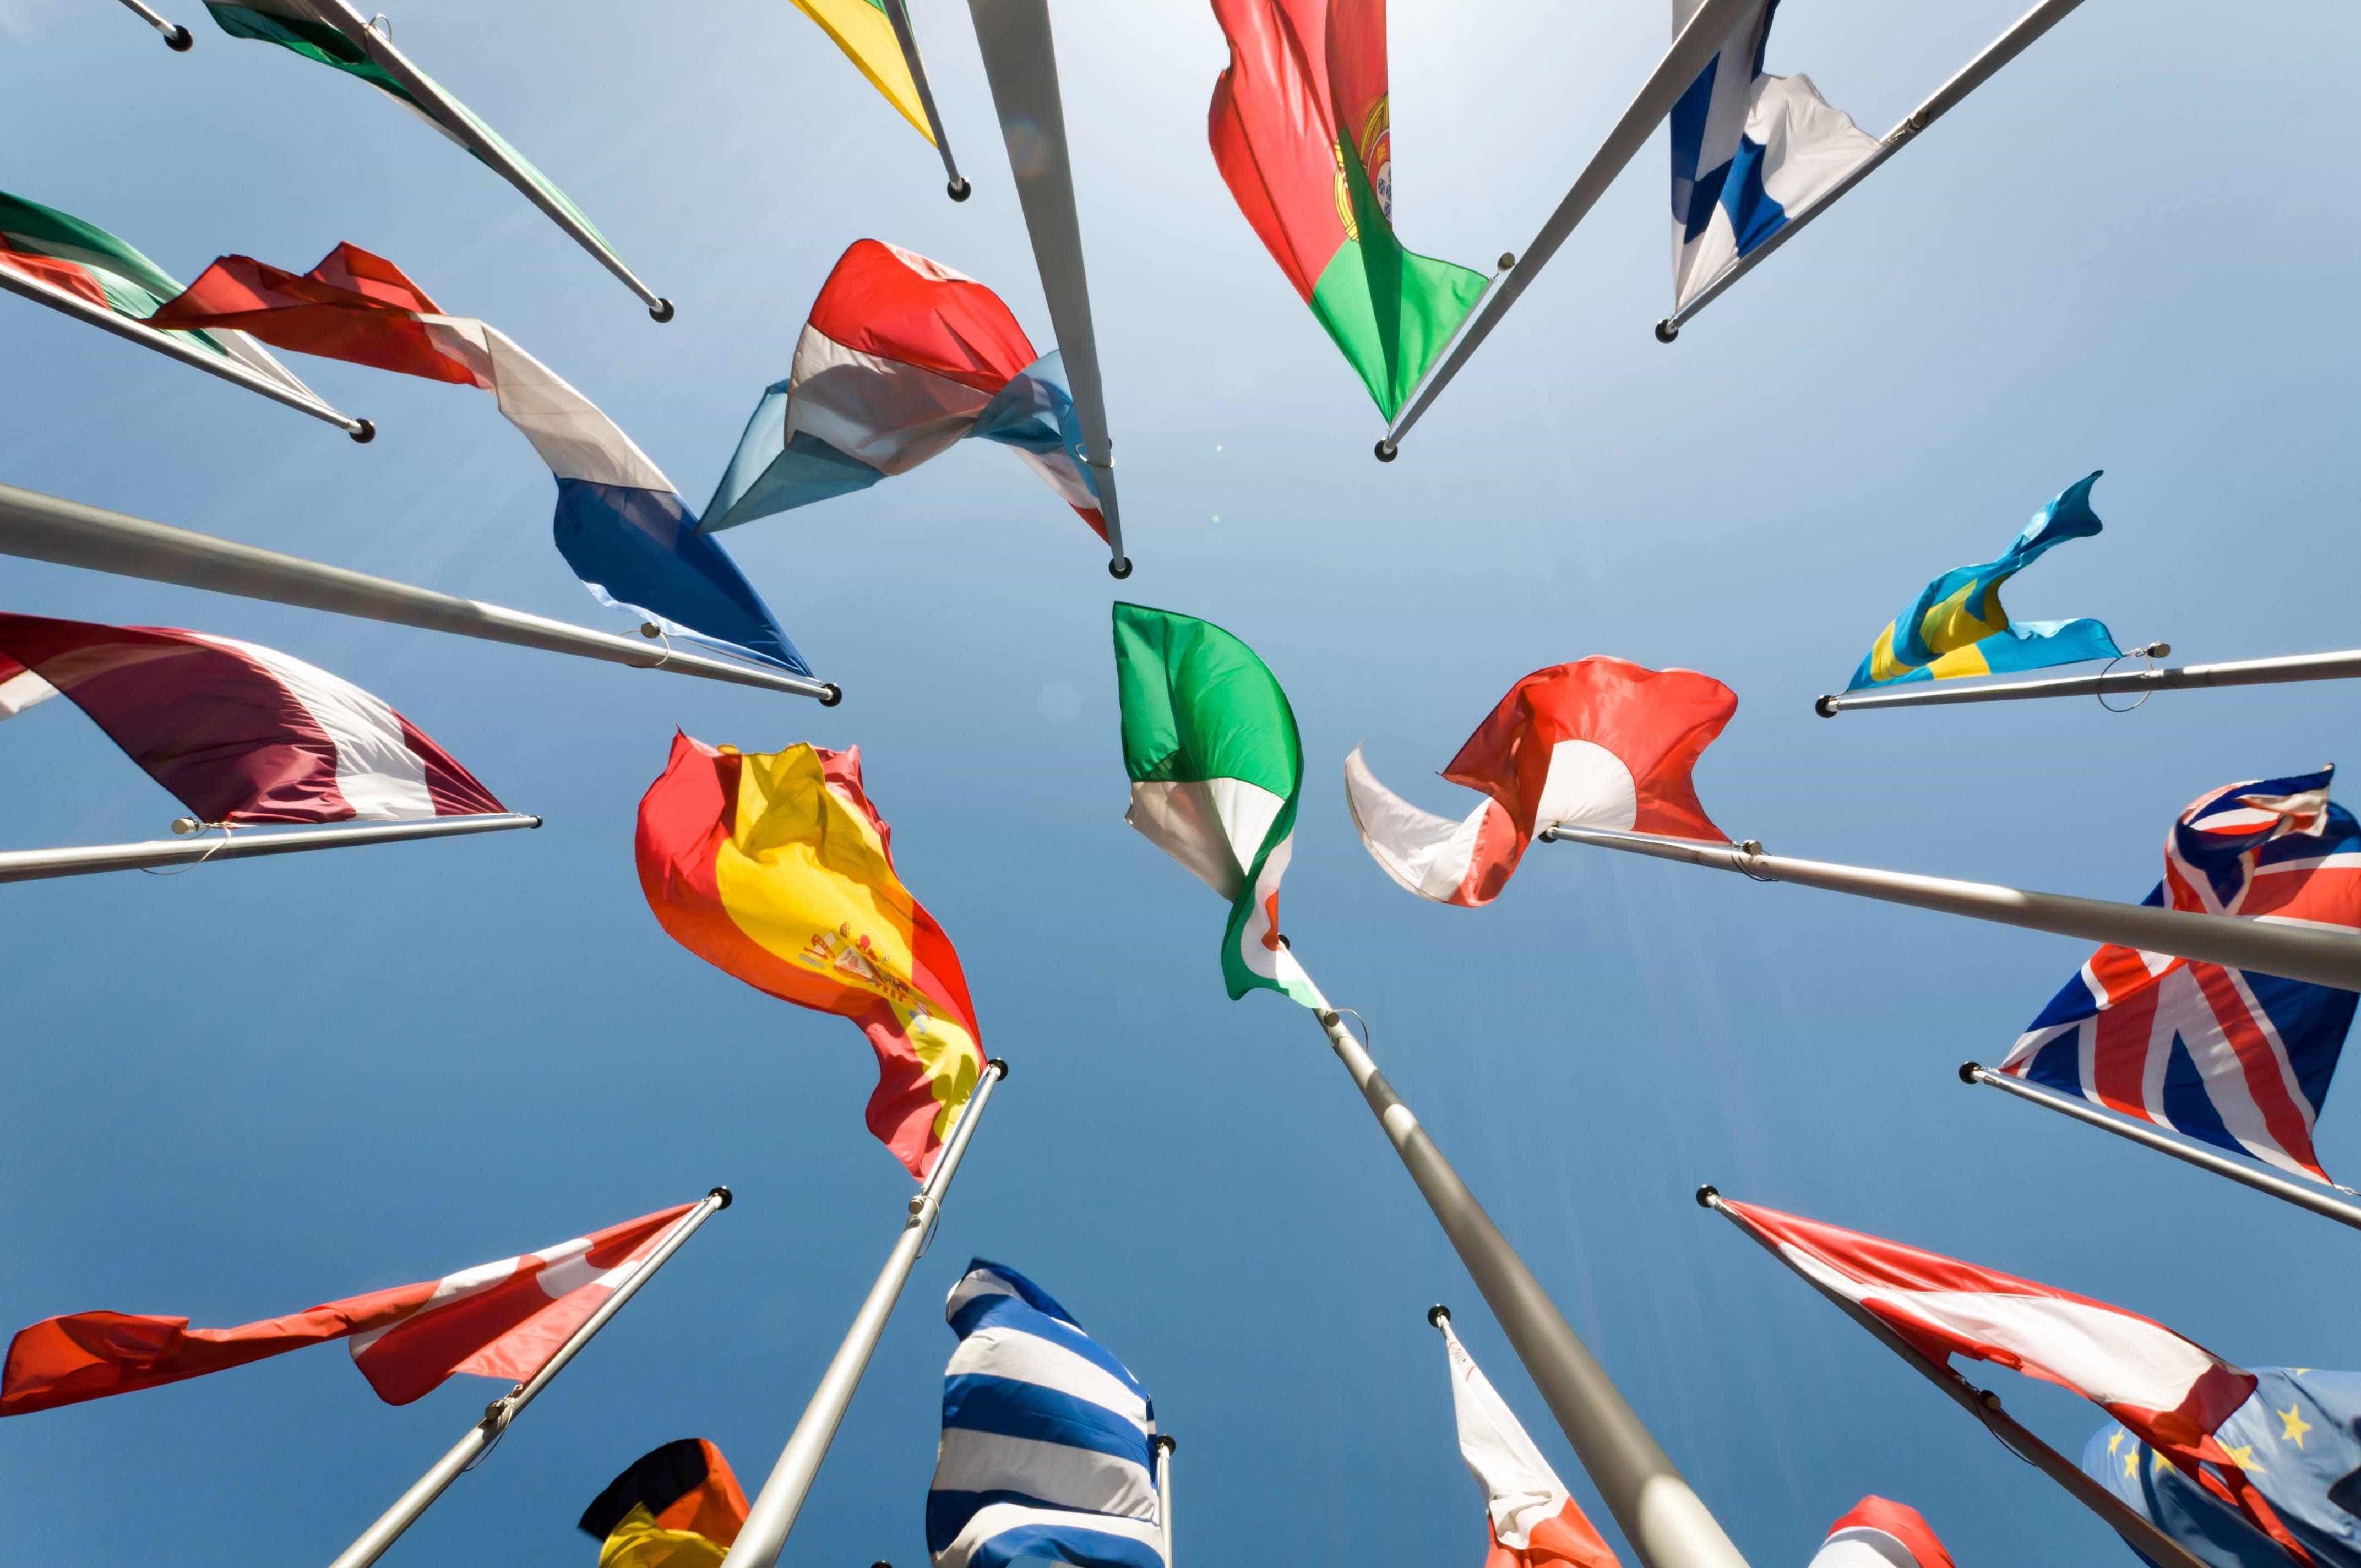 O que influencia a perspetiva dos jovens sobre a Europa?